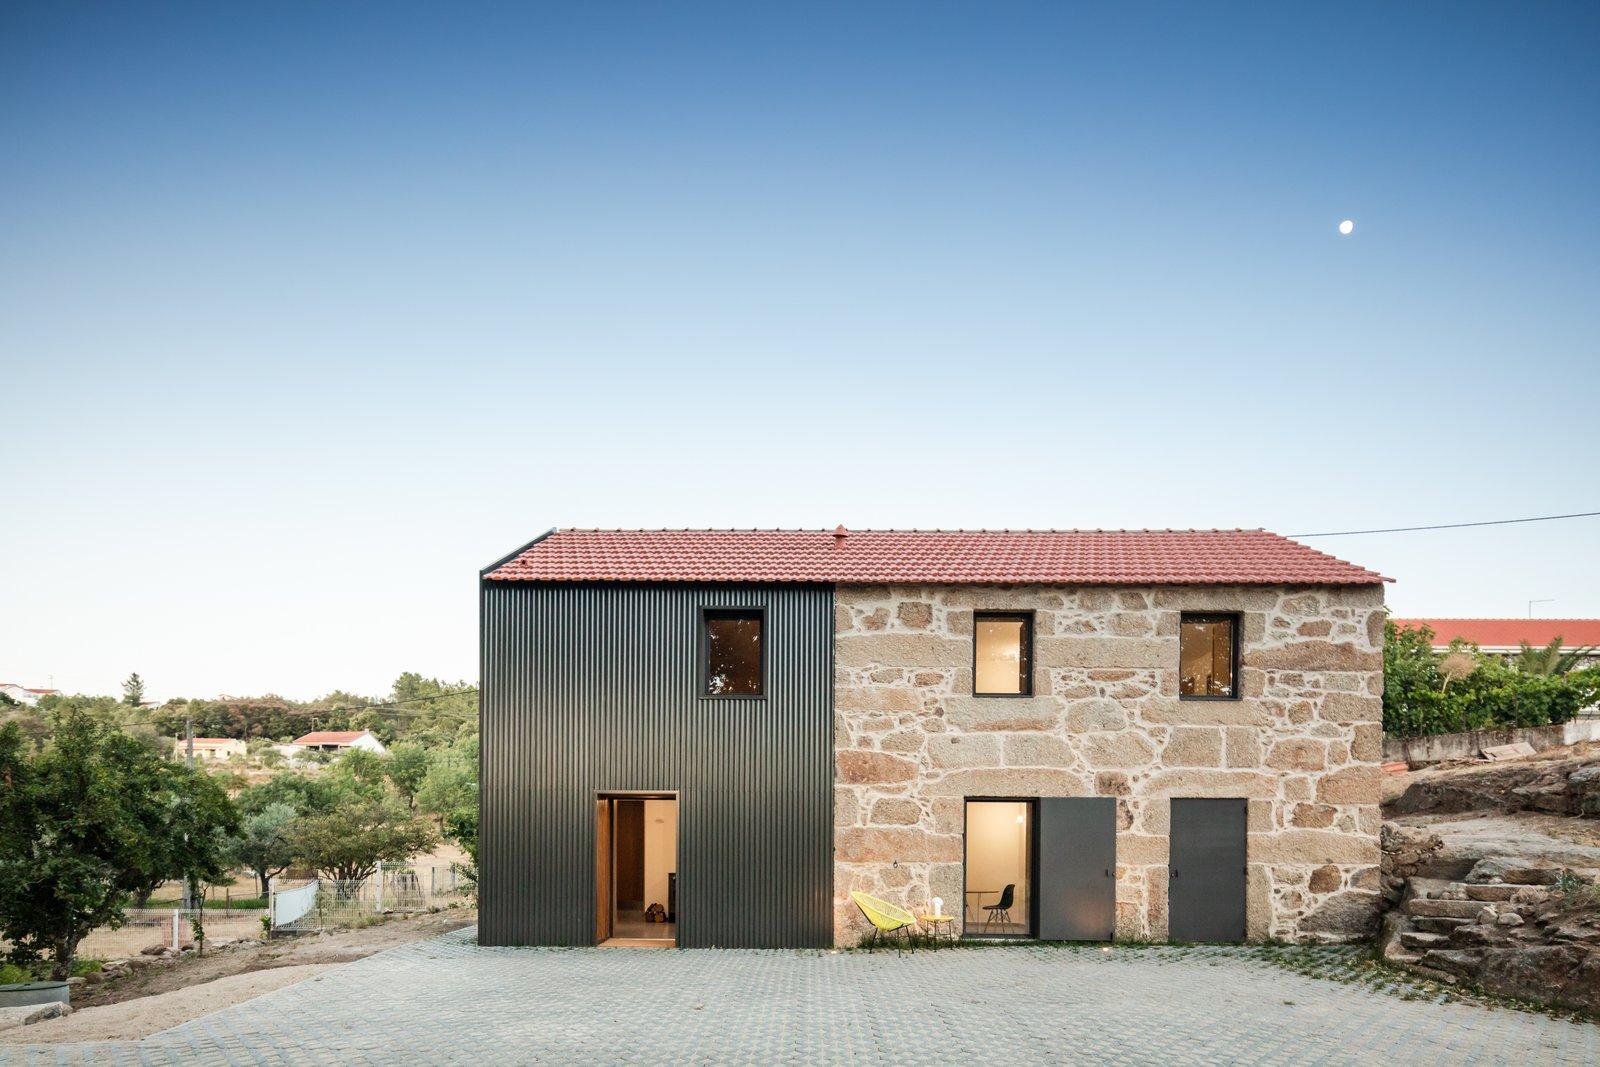 MCR2 House by Filipe Pina Arquitectura Exterior